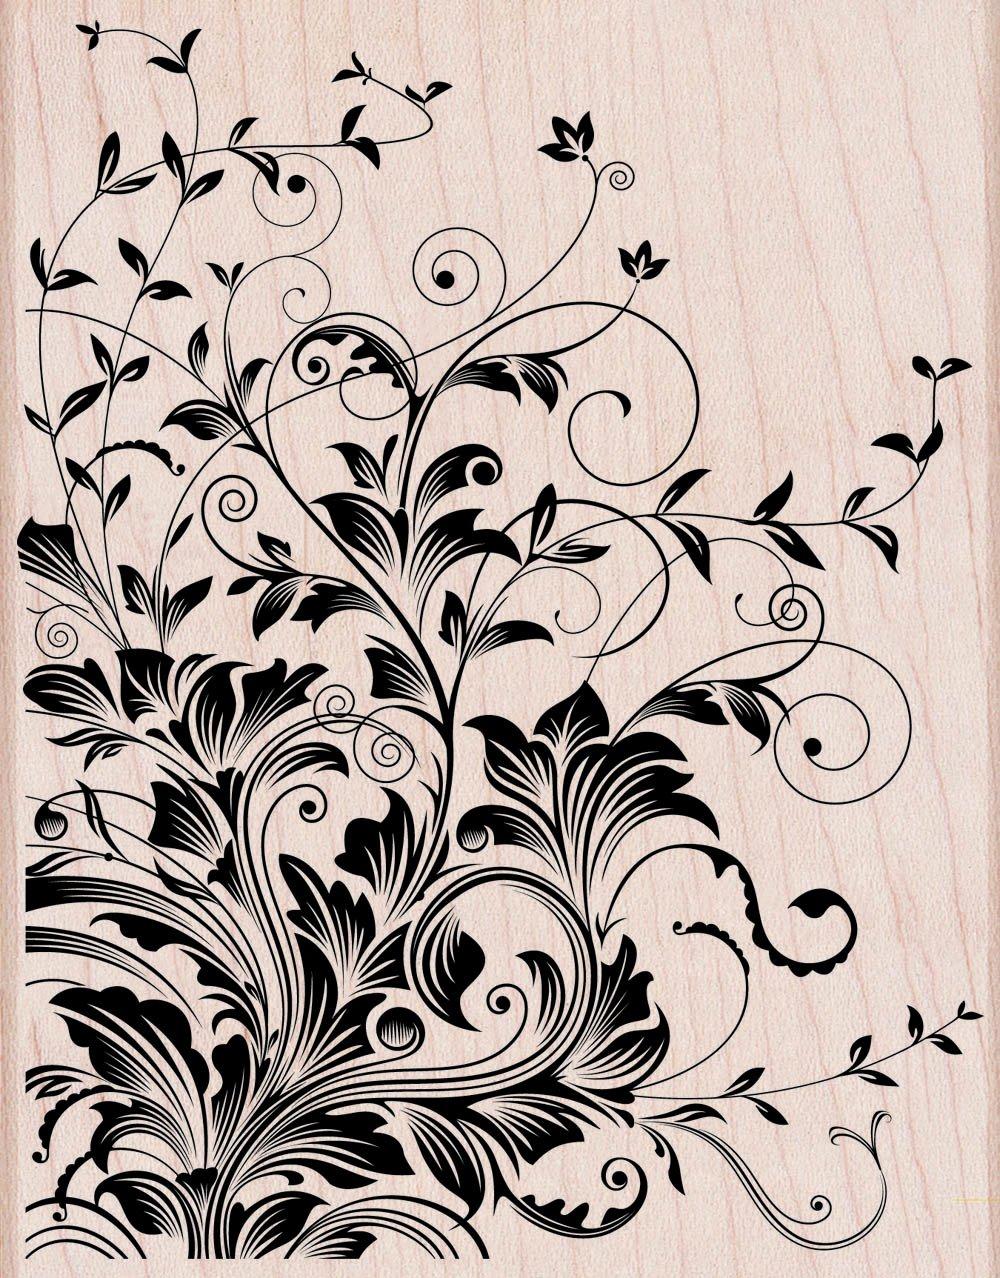 Hero Arts Leafy Vines Woodblock Decorative Stamp by Hero Arts